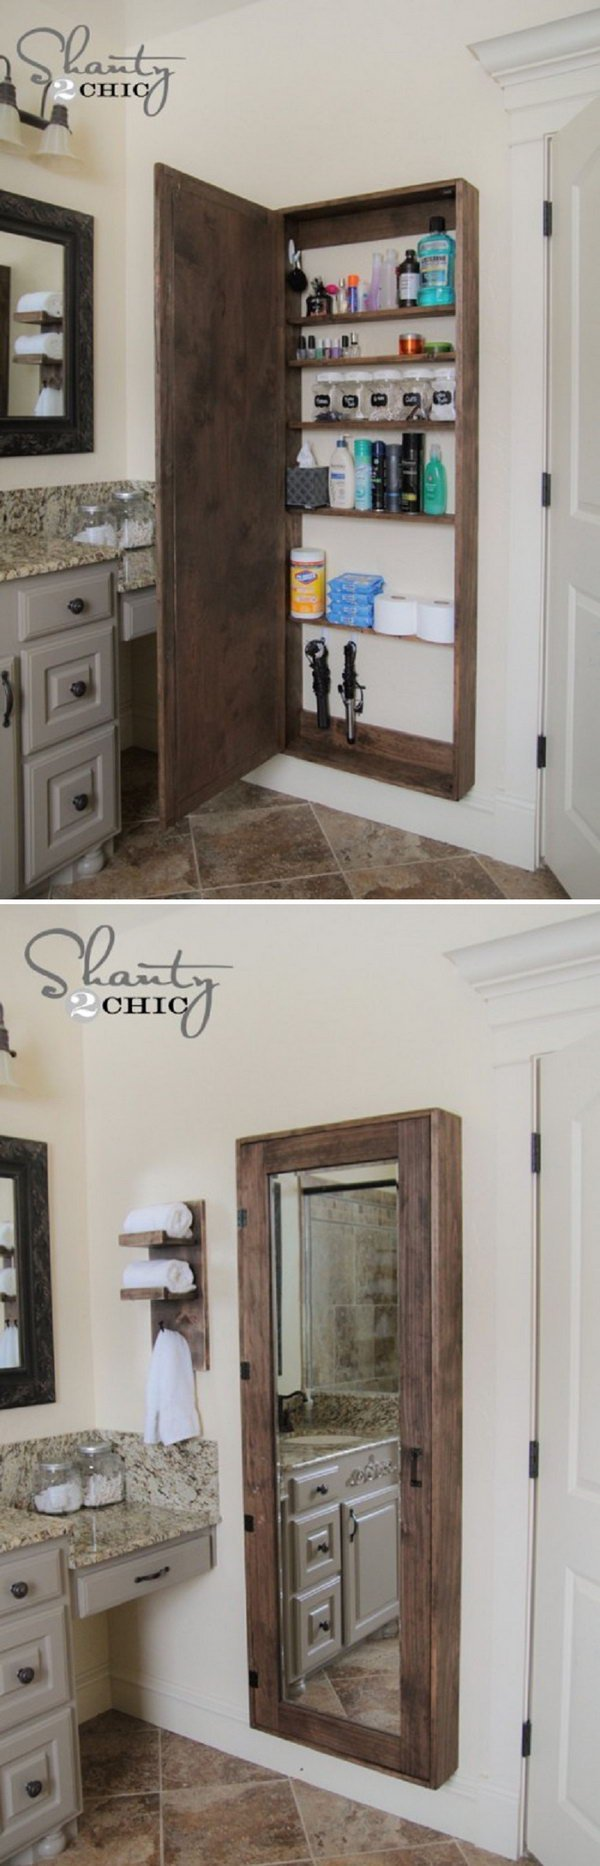 Bathroom Storage Case Behind The Mirror